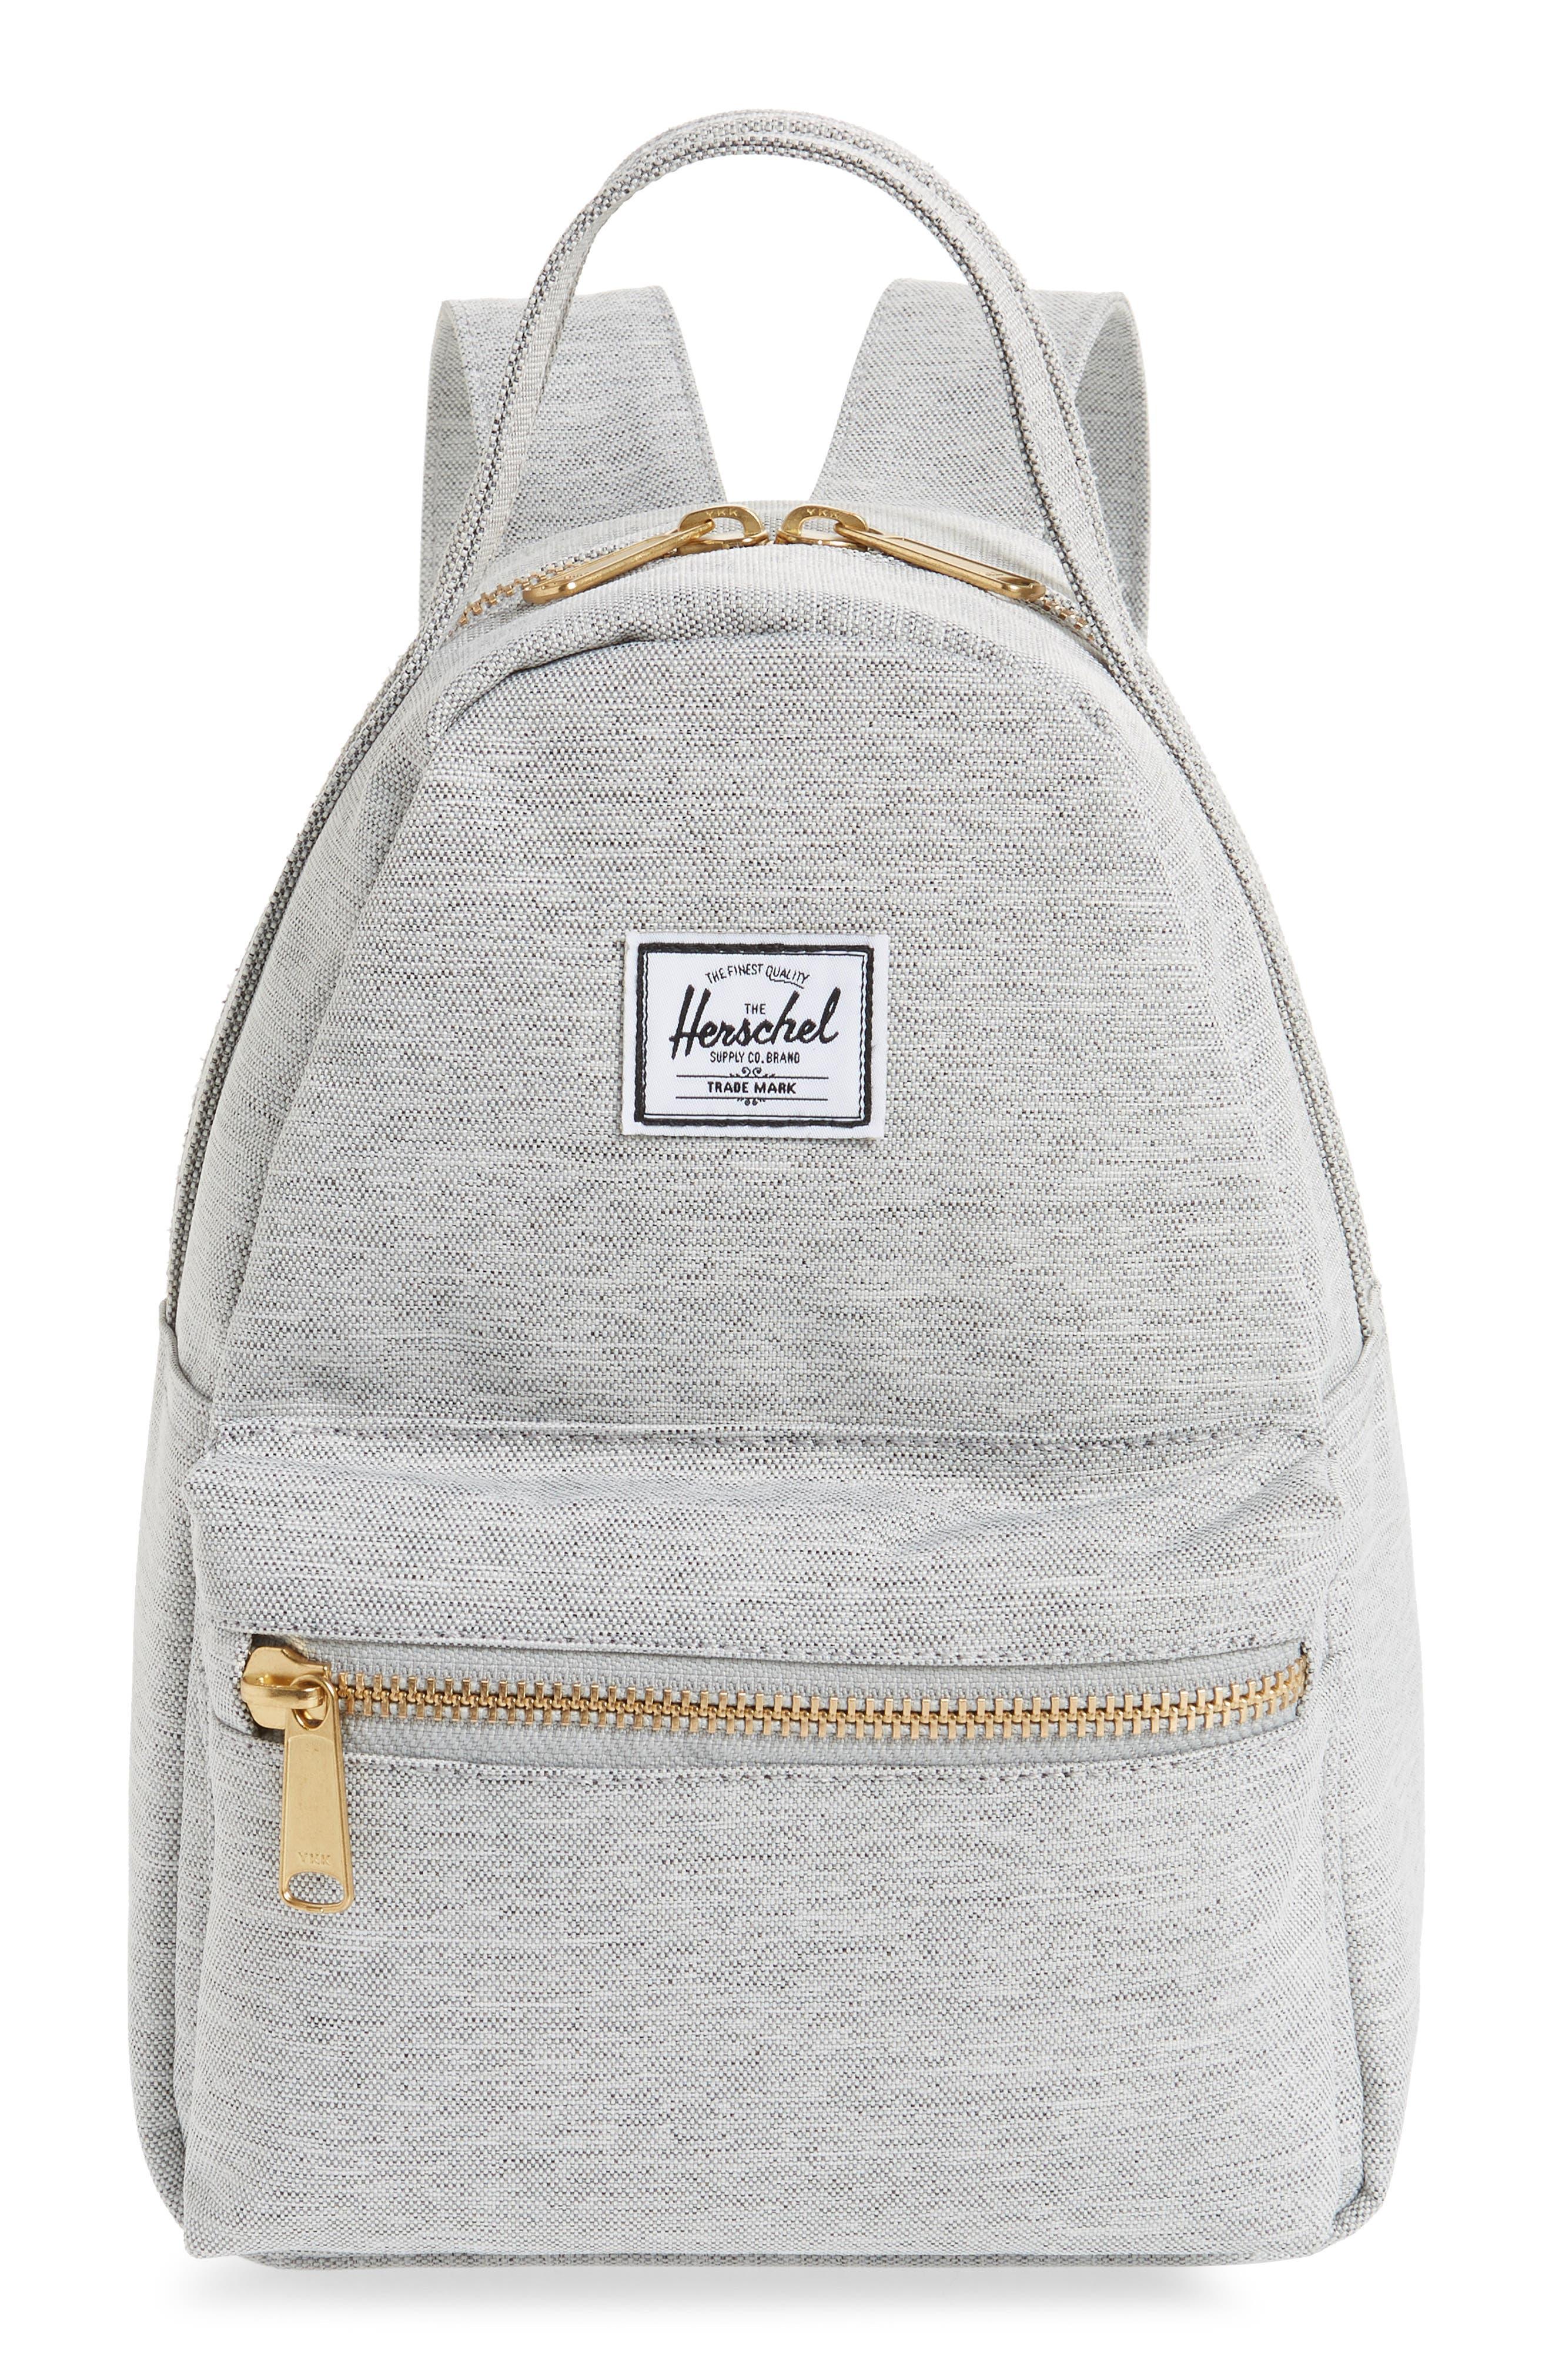 Herschel Supply Co. Mini Nova Backpack - Grey